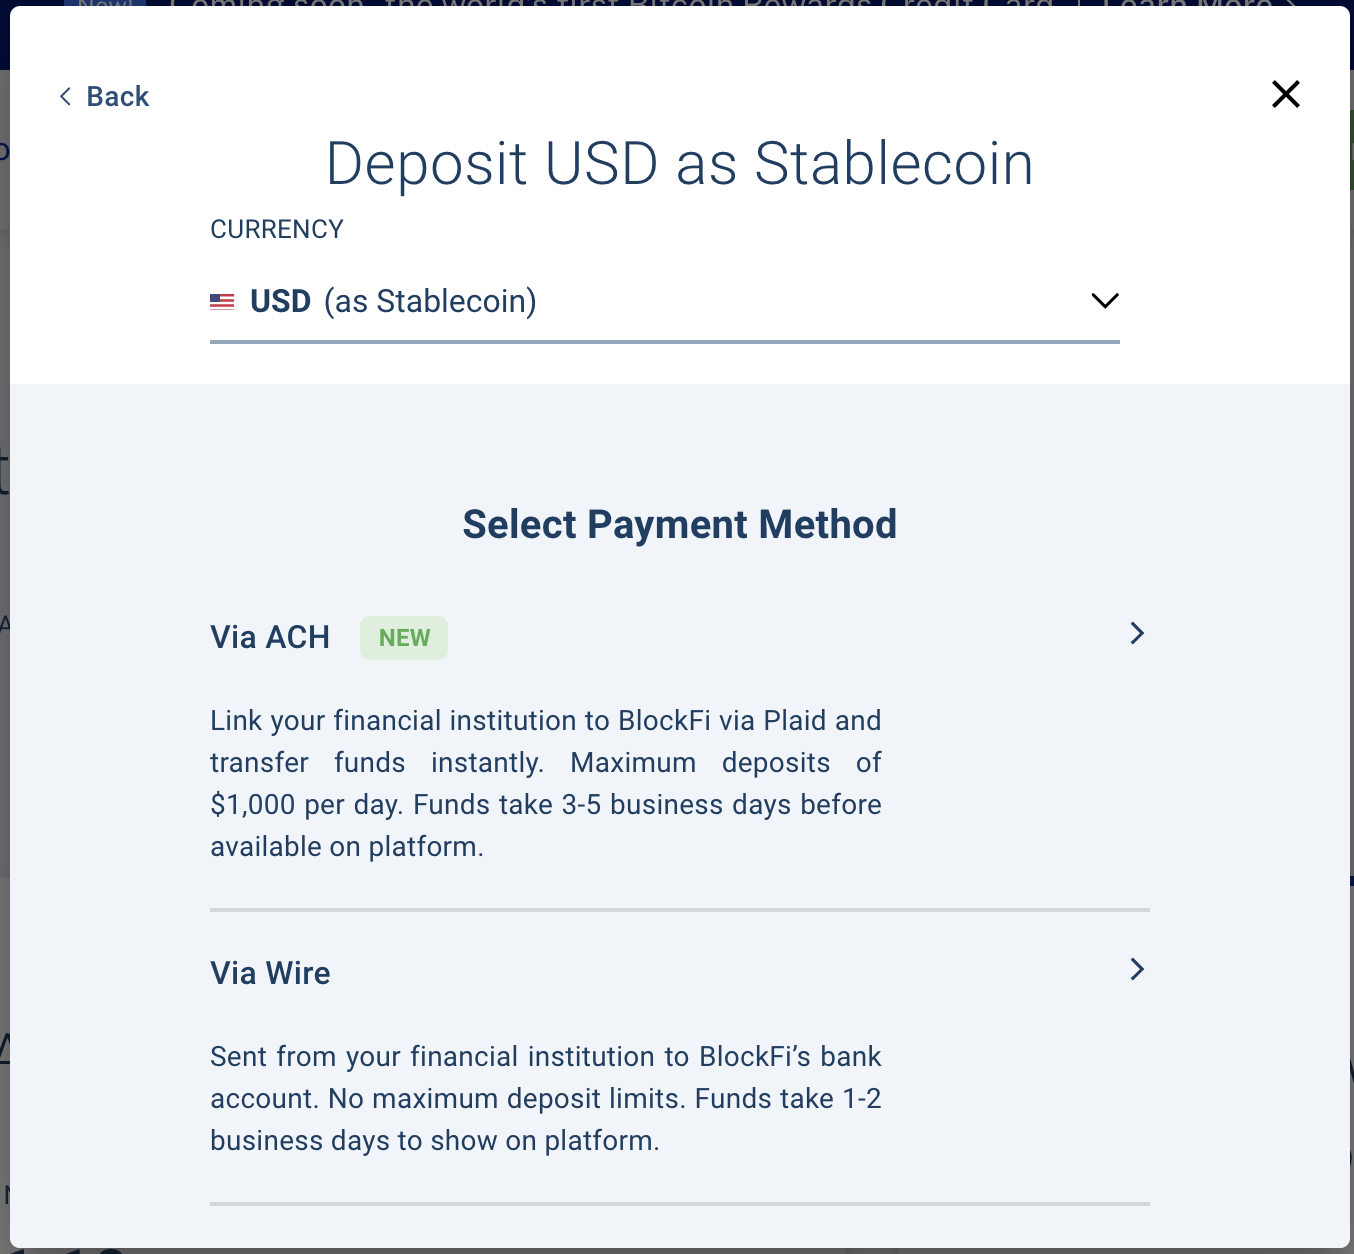 BlockFi deposit